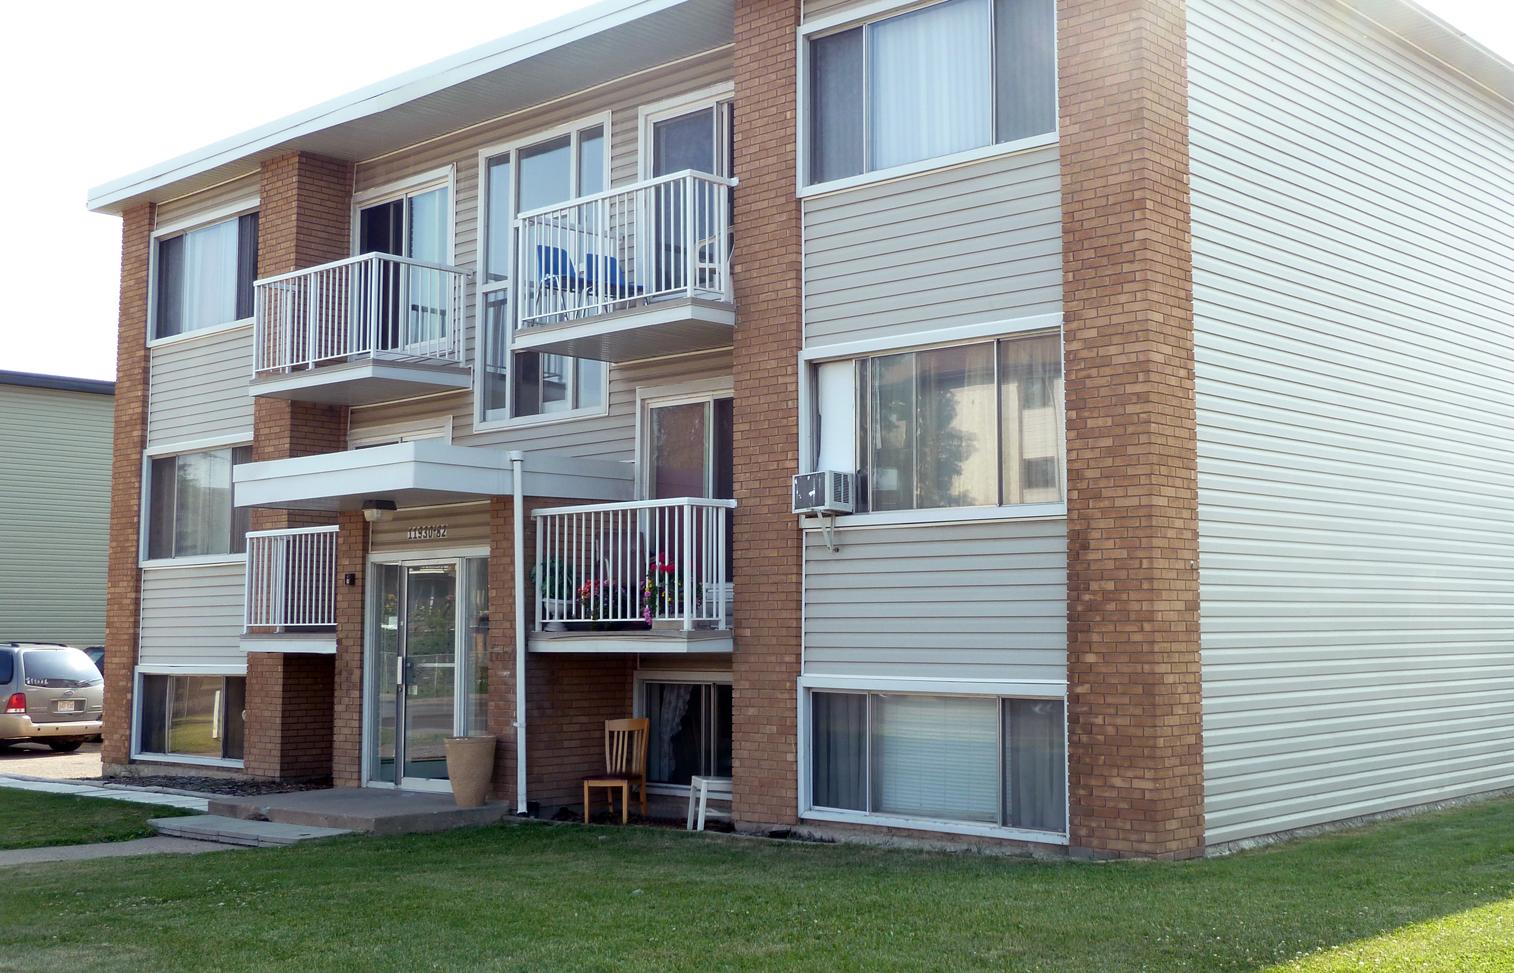 11930 82 Street NW, Edmonton, AB - $799 CAD/ month